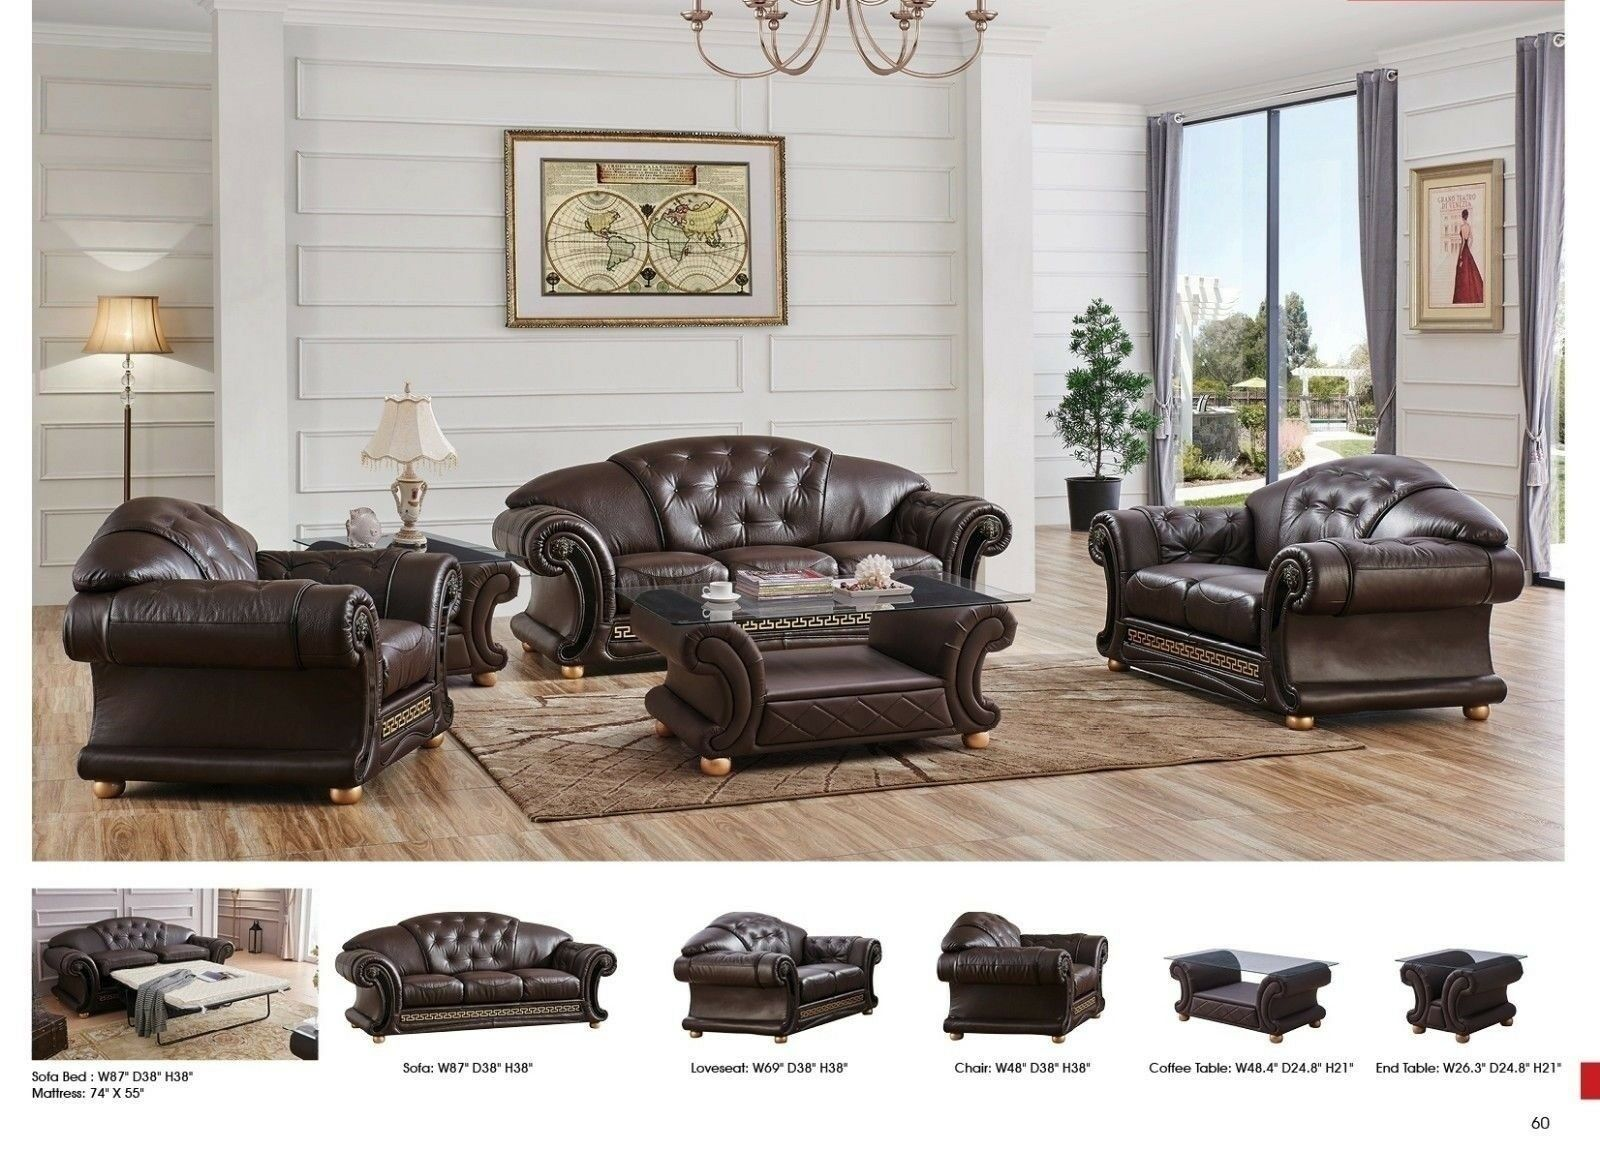 Marvelous Brown Genuine Top Grain Italian Leather Luxurious Living Room Sofa Loveseat Set Pdpeps Interior Chair Design Pdpepsorg